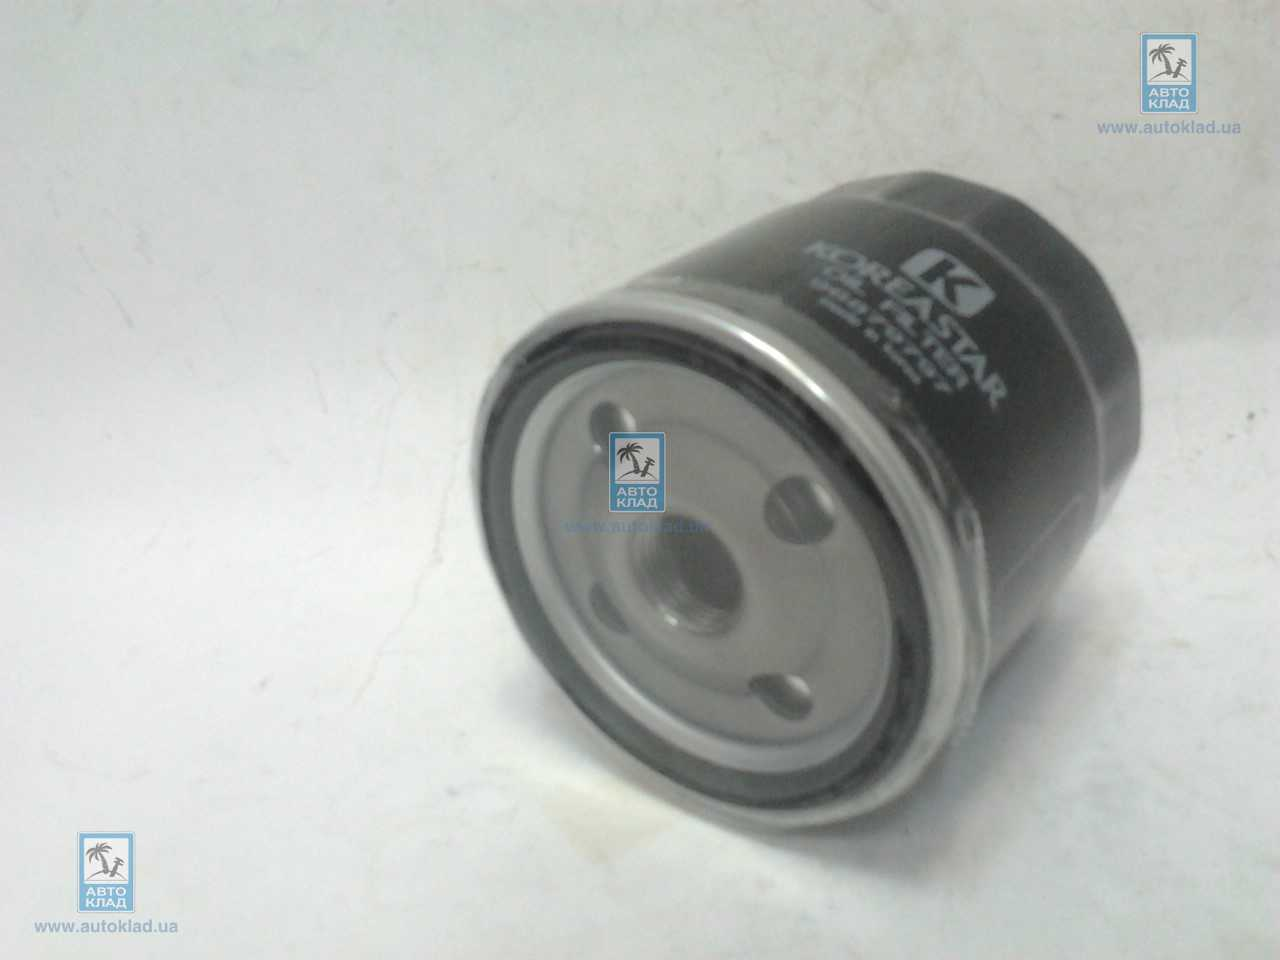 Фильтр масляный KOREASTAR KFLD002